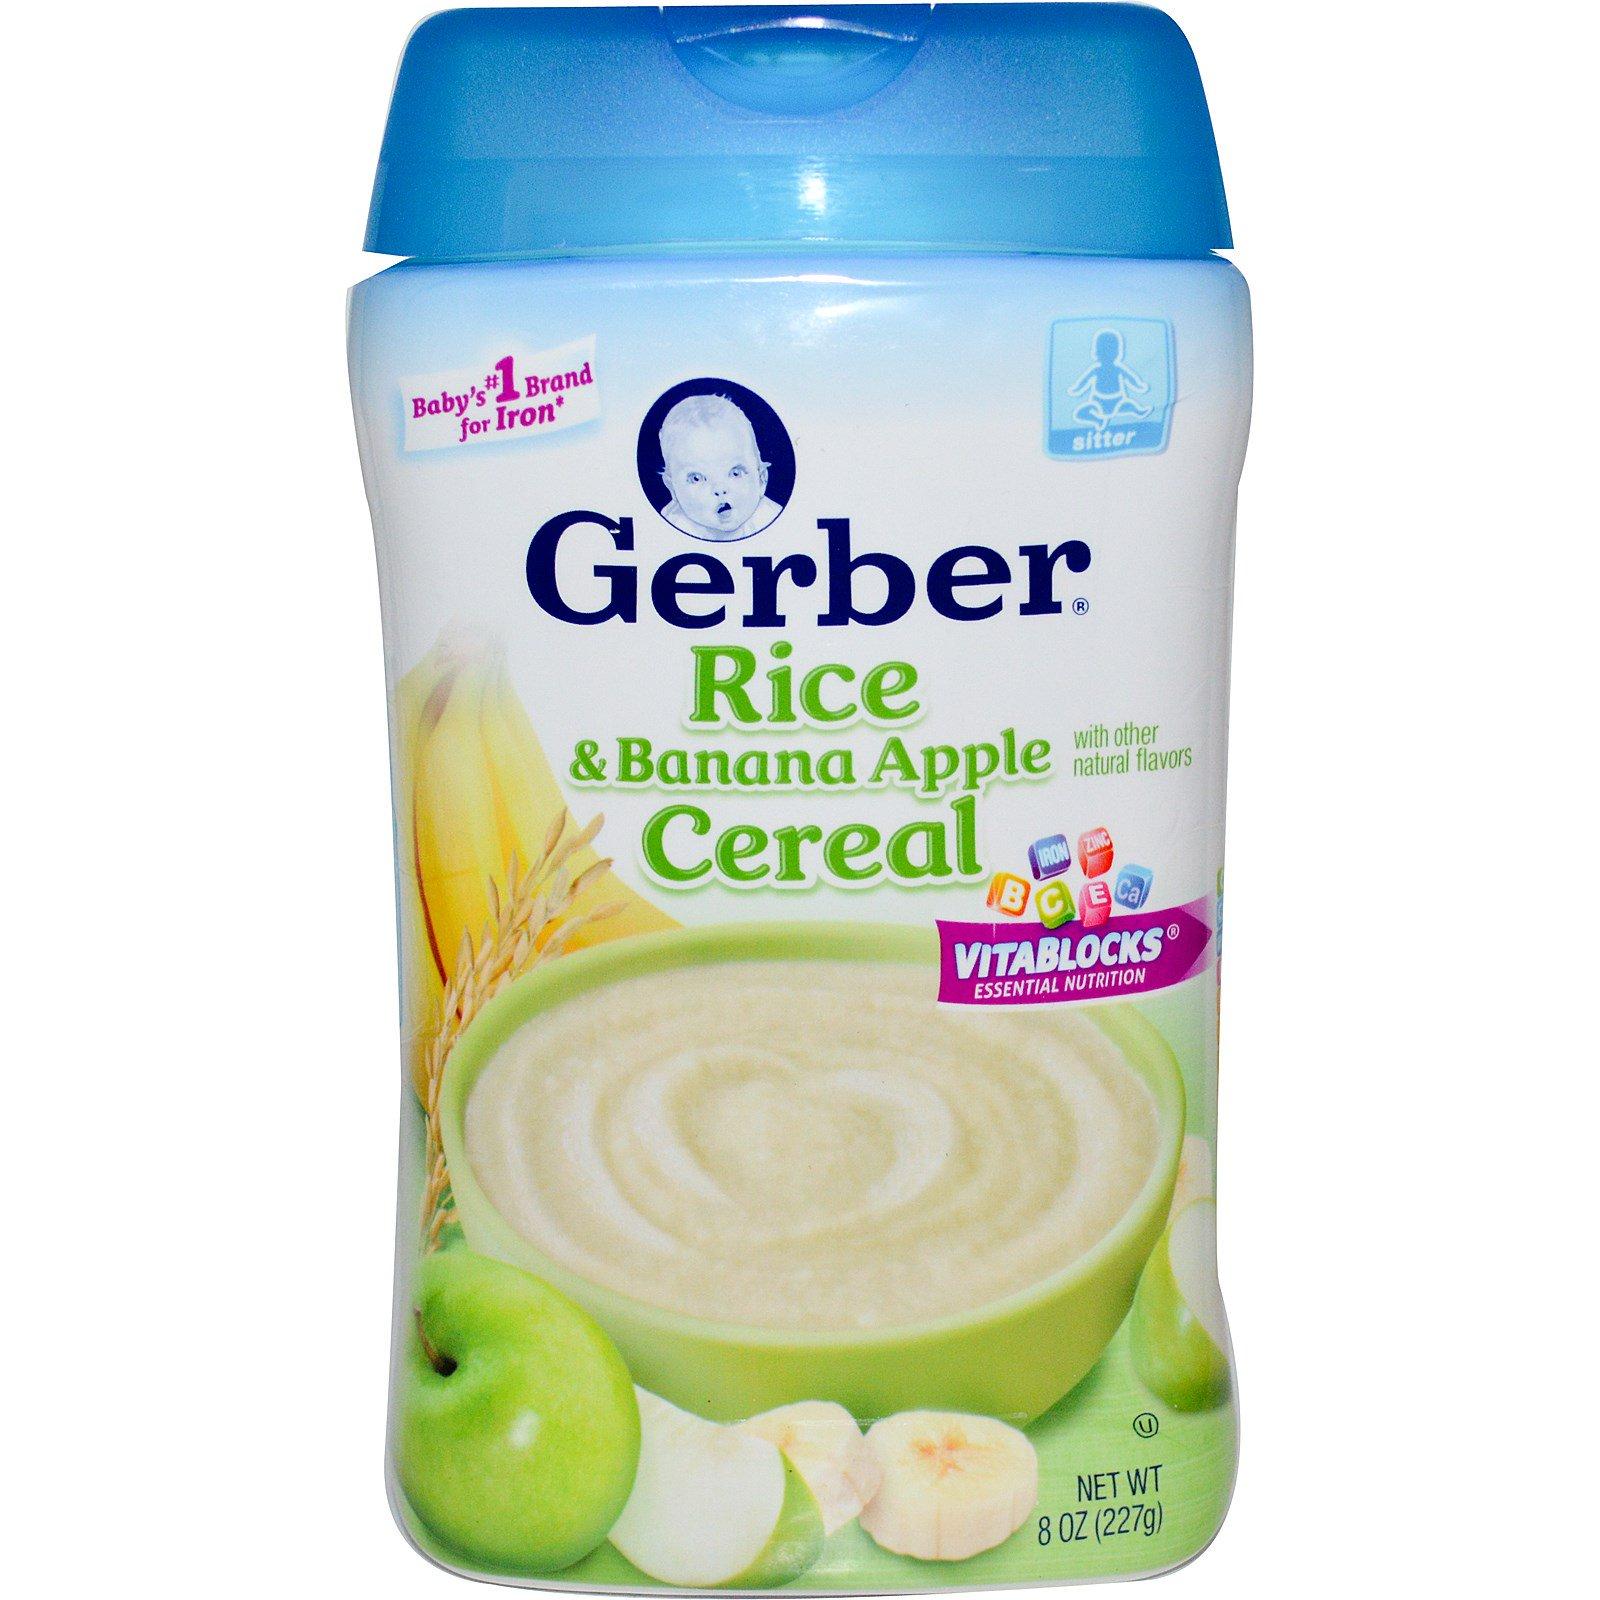 Gerber, Rice & Banana Apple Cereal, 8 Oz (227 G)